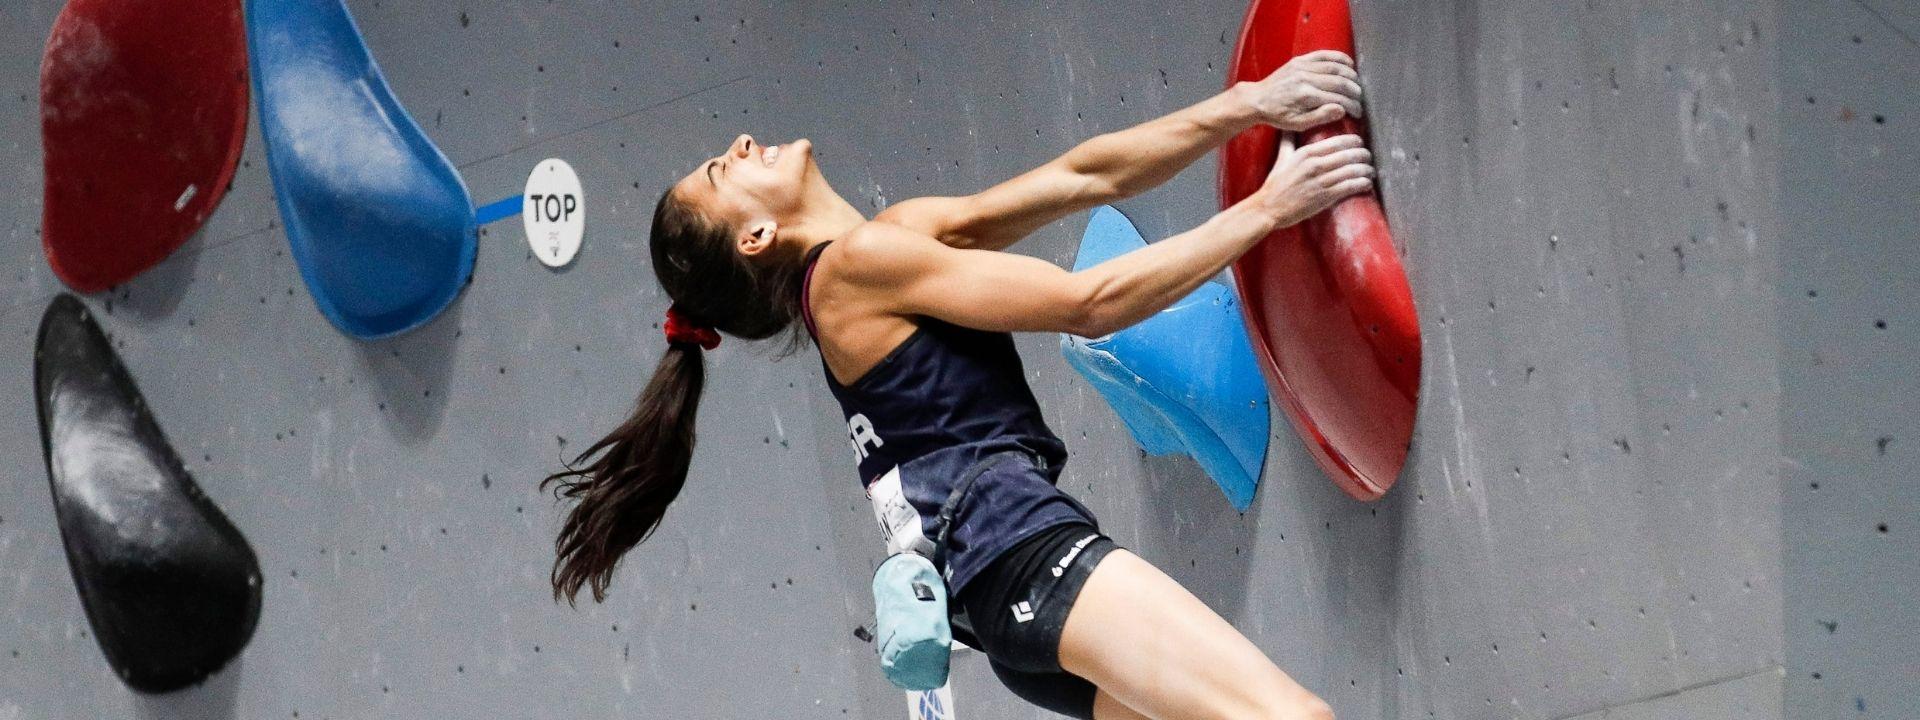 GROSSMAN SEES GOLD IN WOMEN'S BOULDER WORLD CHAMPIONSHIP